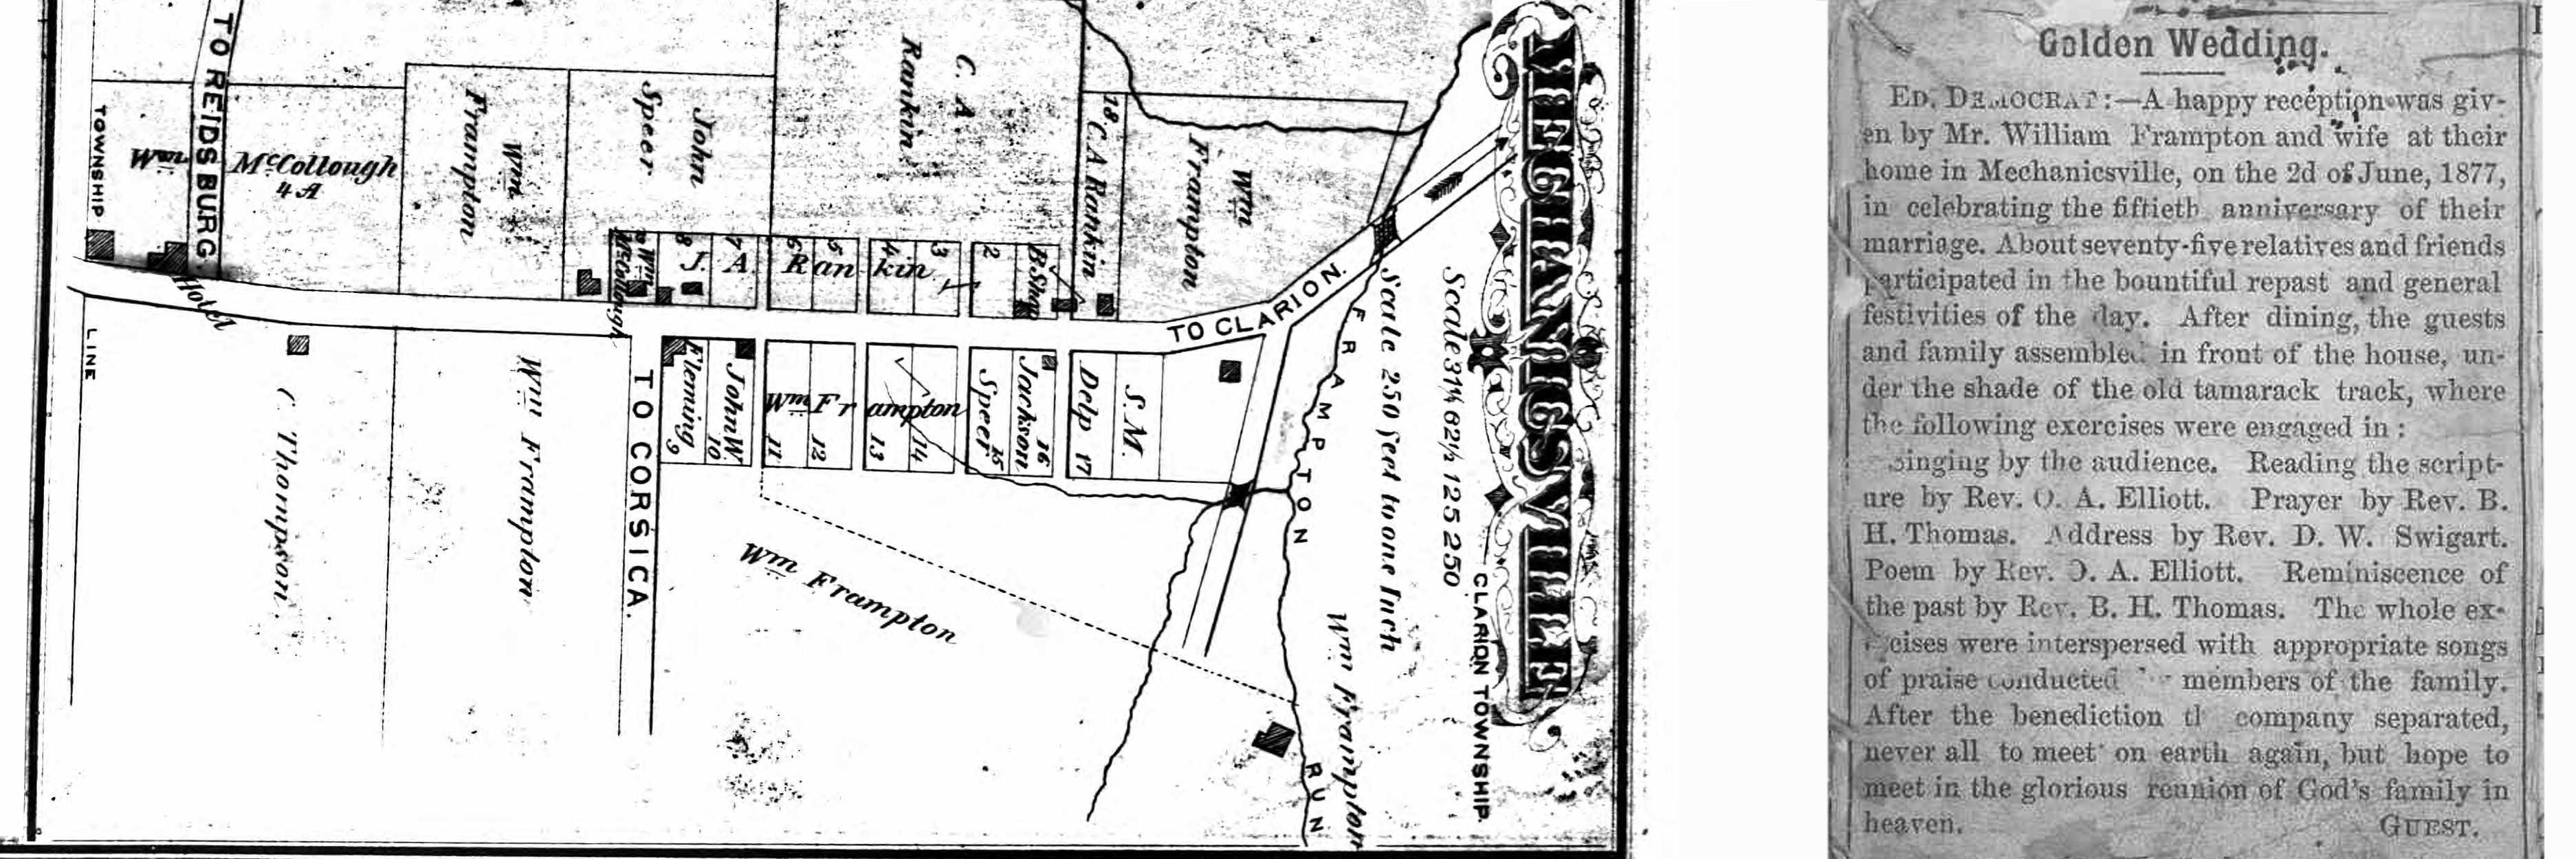 Mechanicsville 1877